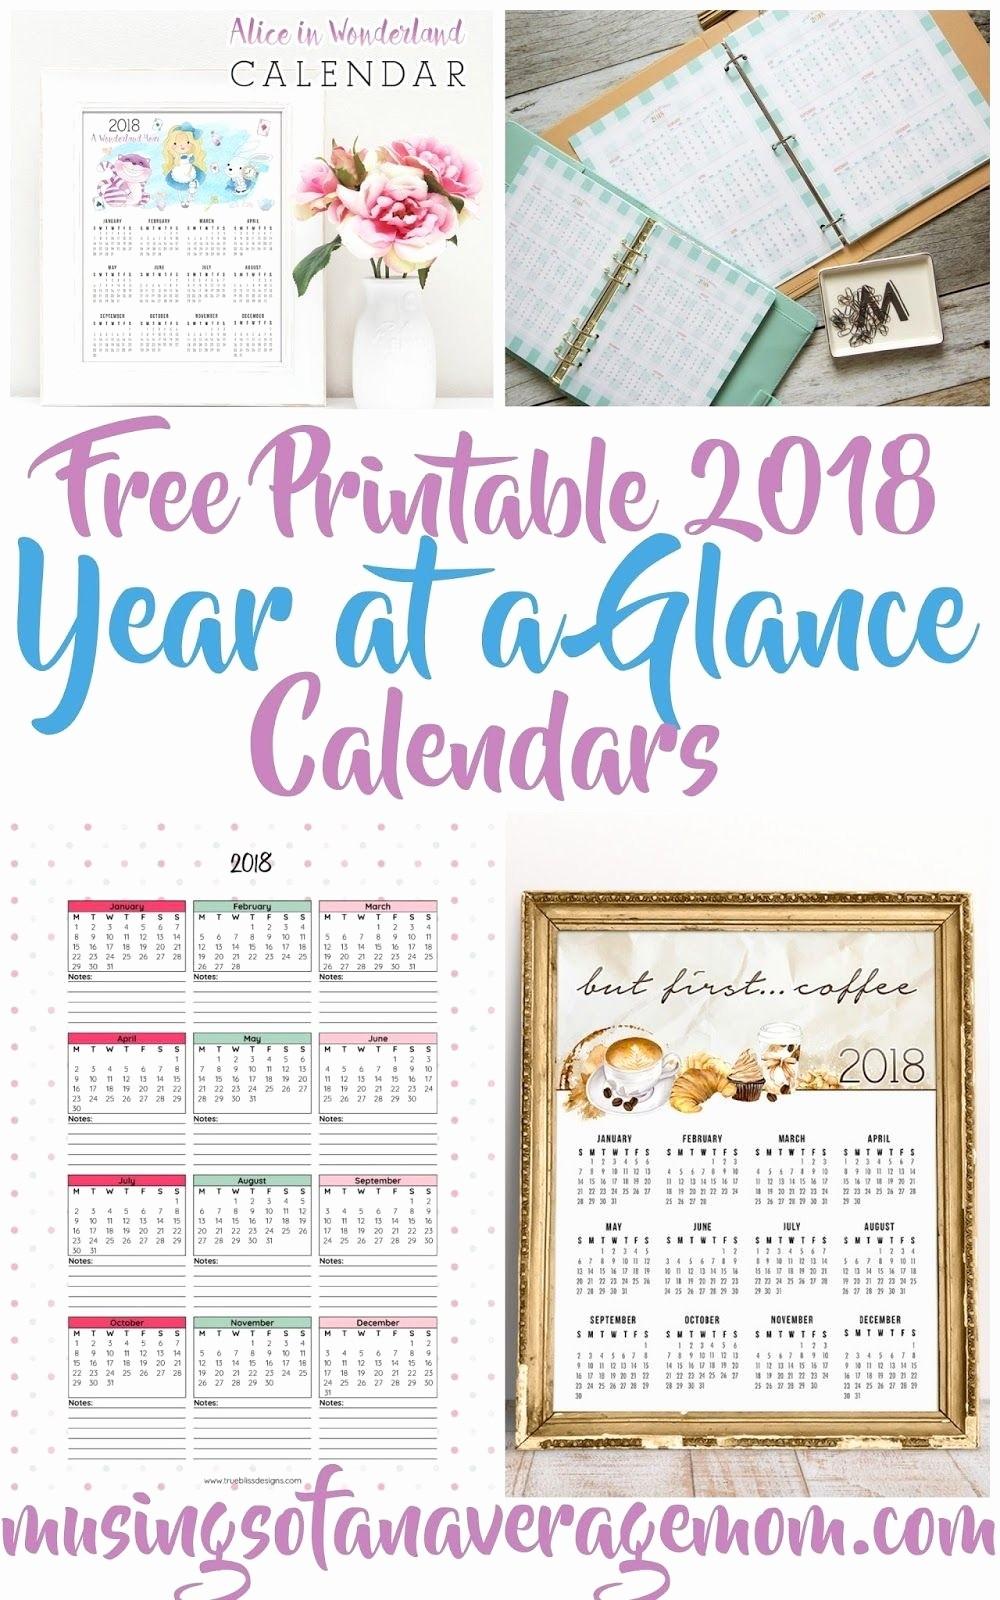 At A Glance 2018 Calendar Luxury Year at A Glance 2018 Printable – Template Calendar Design